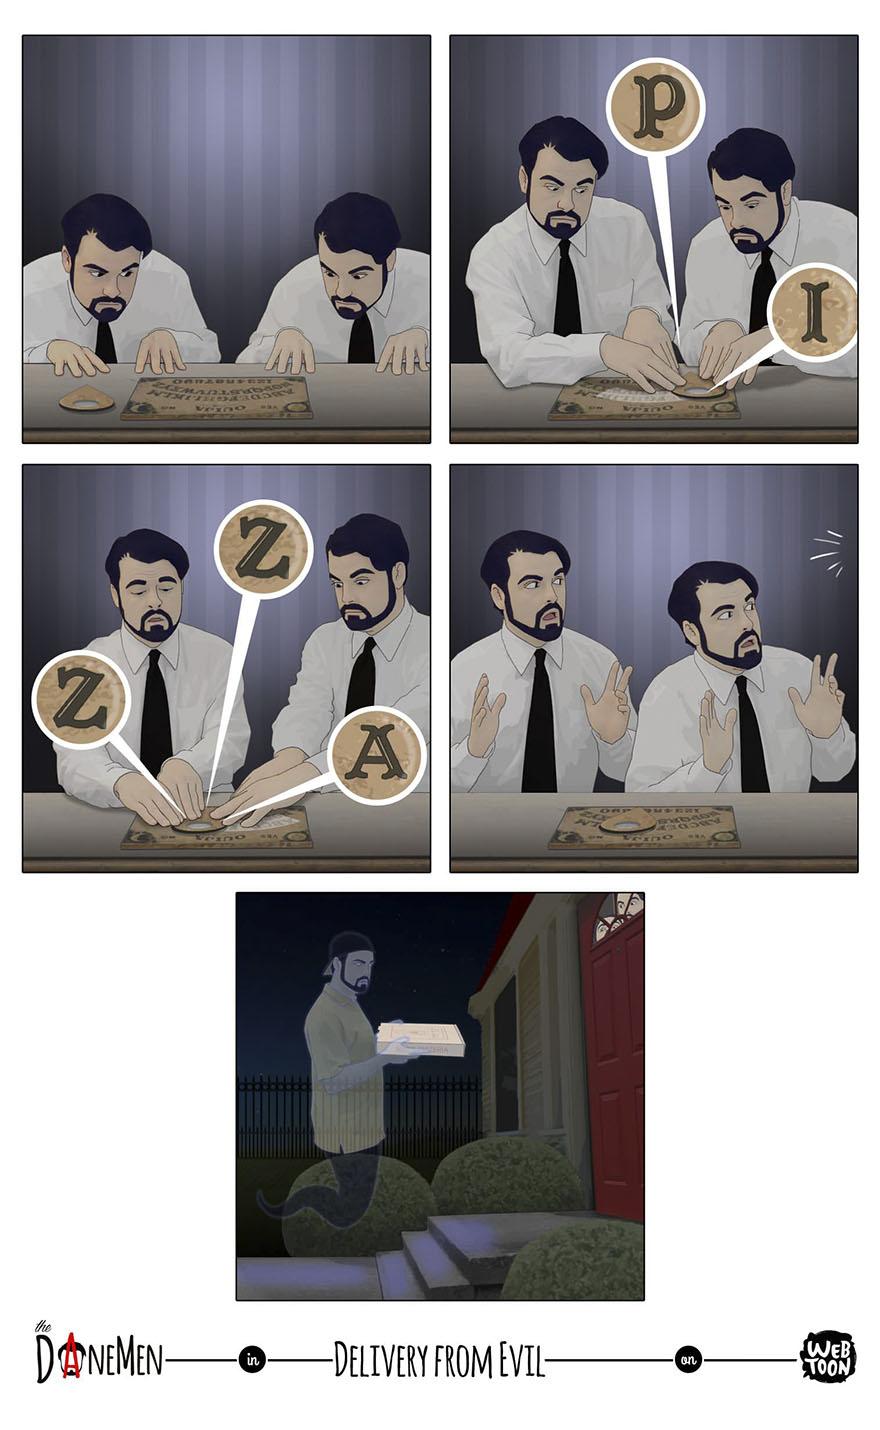 The Danemen Comics